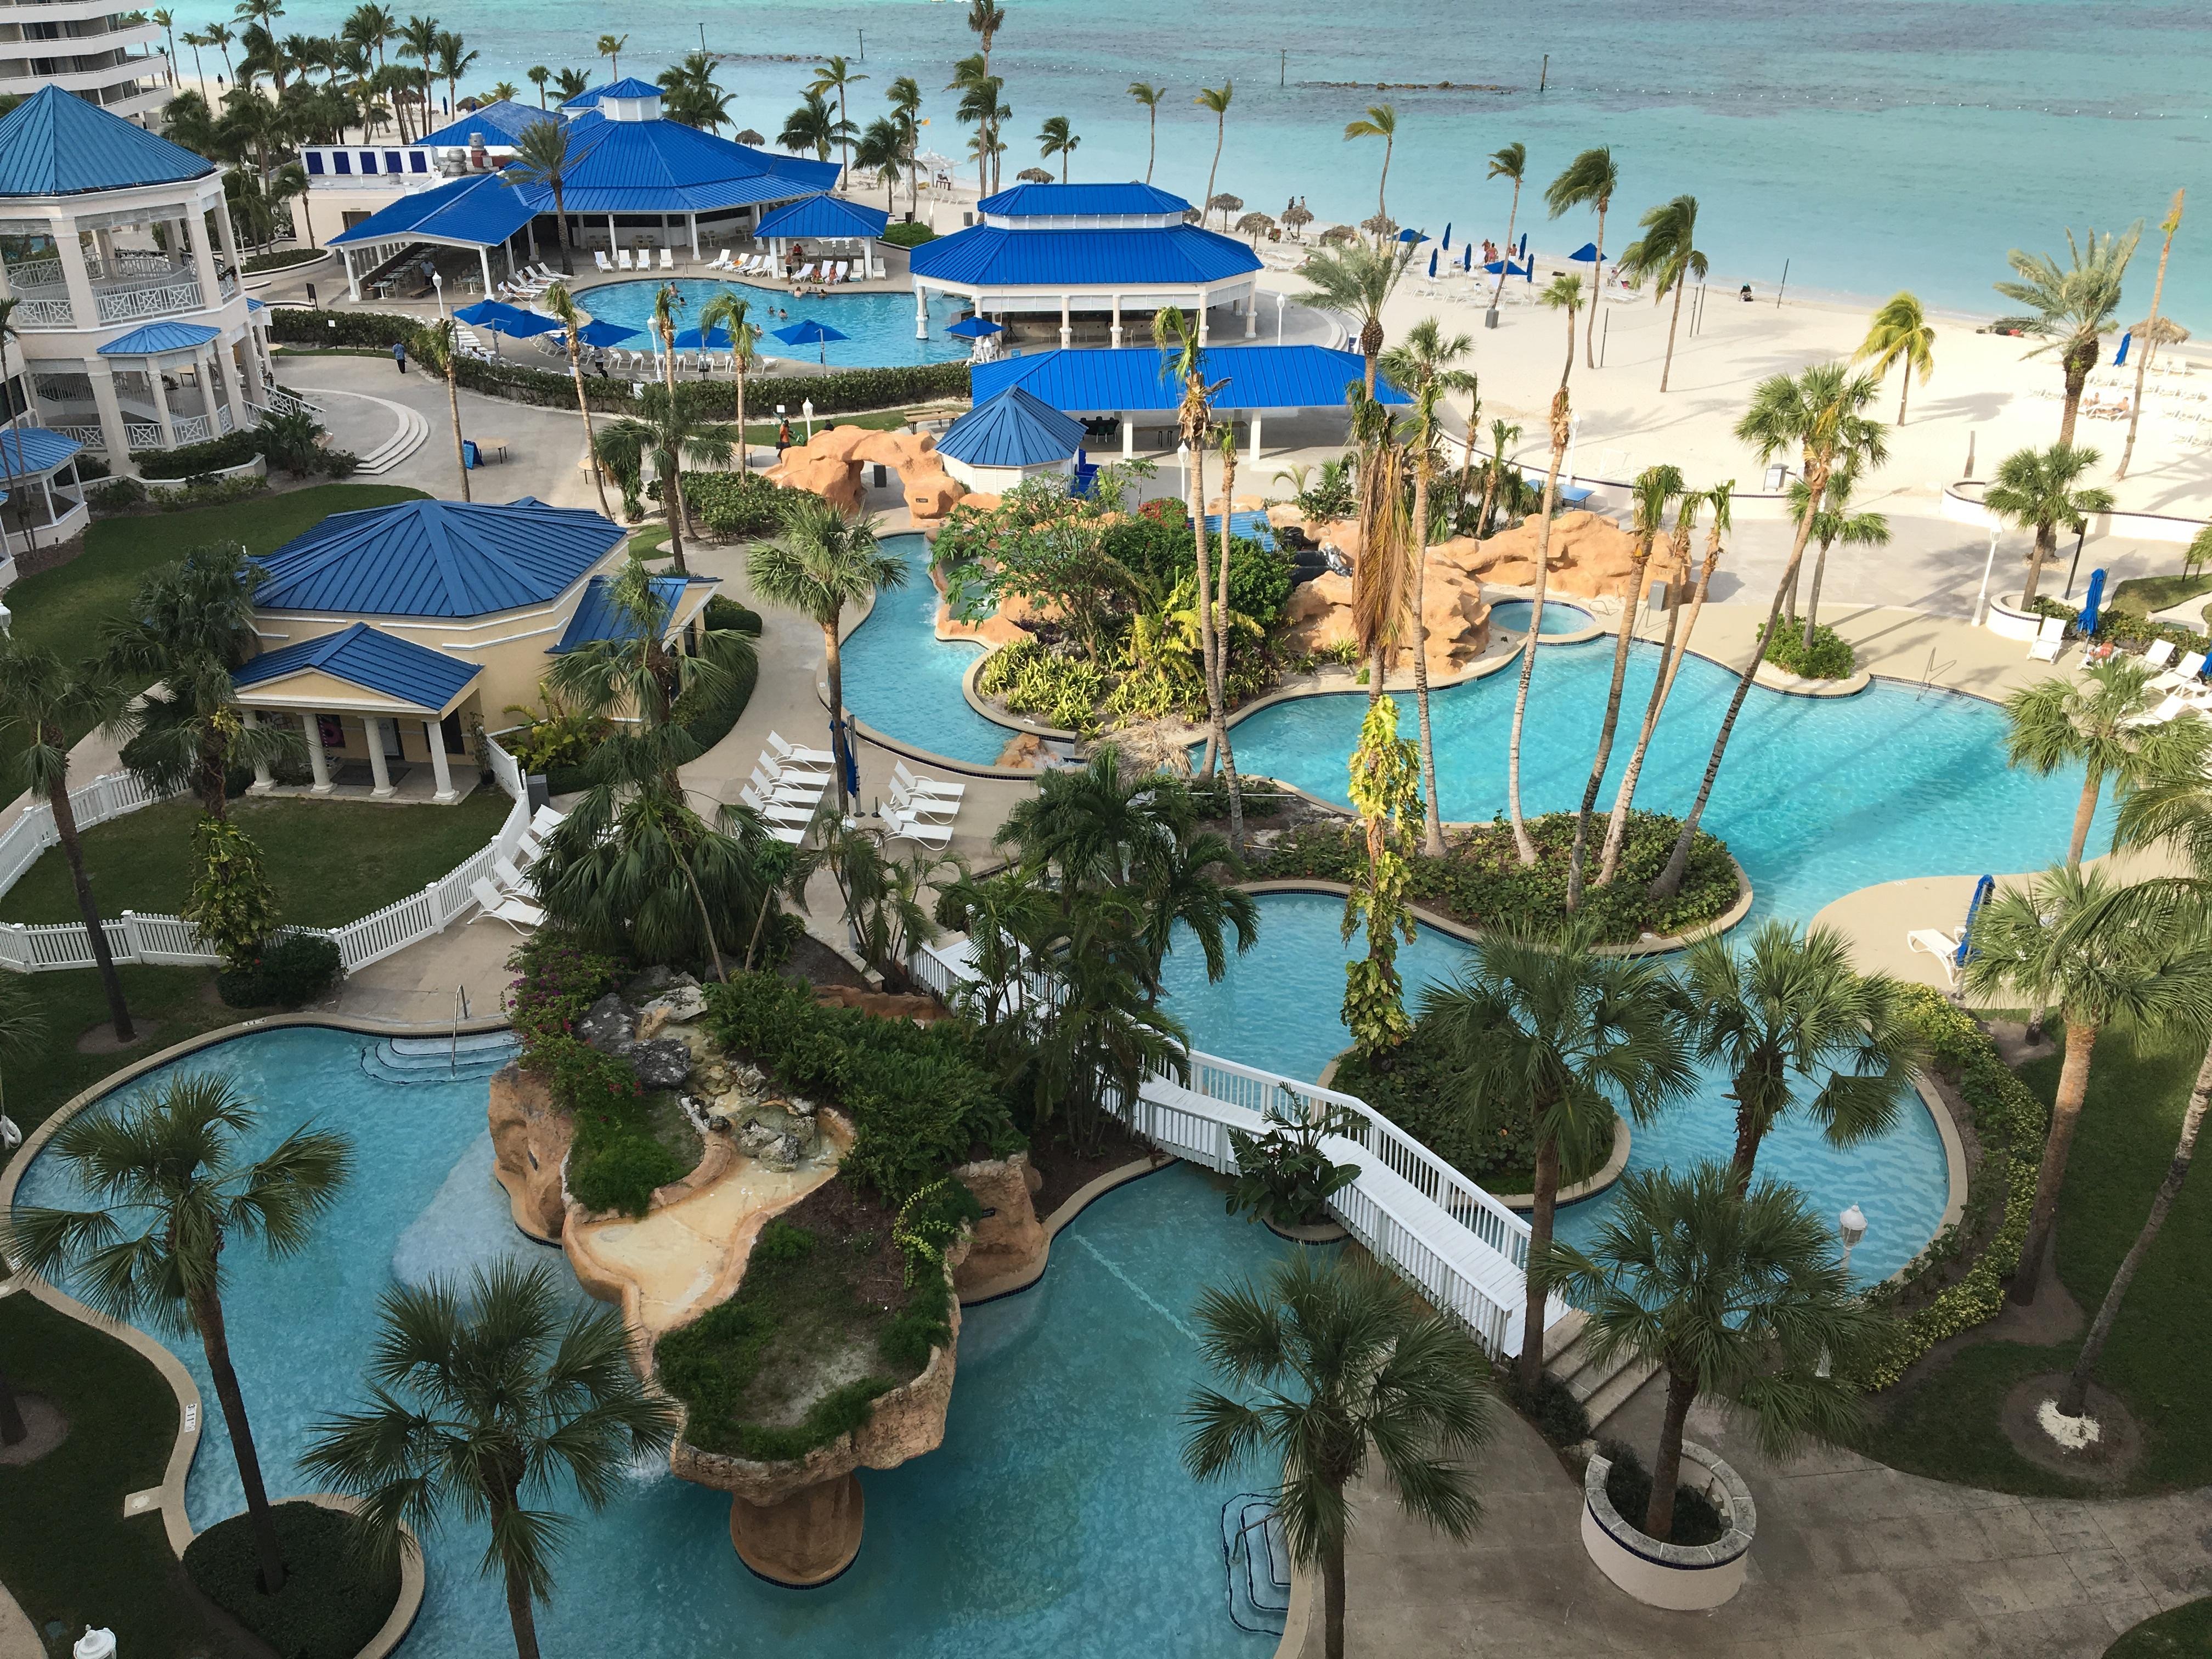 c6eb1812e2d2 The Melia Nassau Beach is conveniently located near an abundance of  available transportation (buses